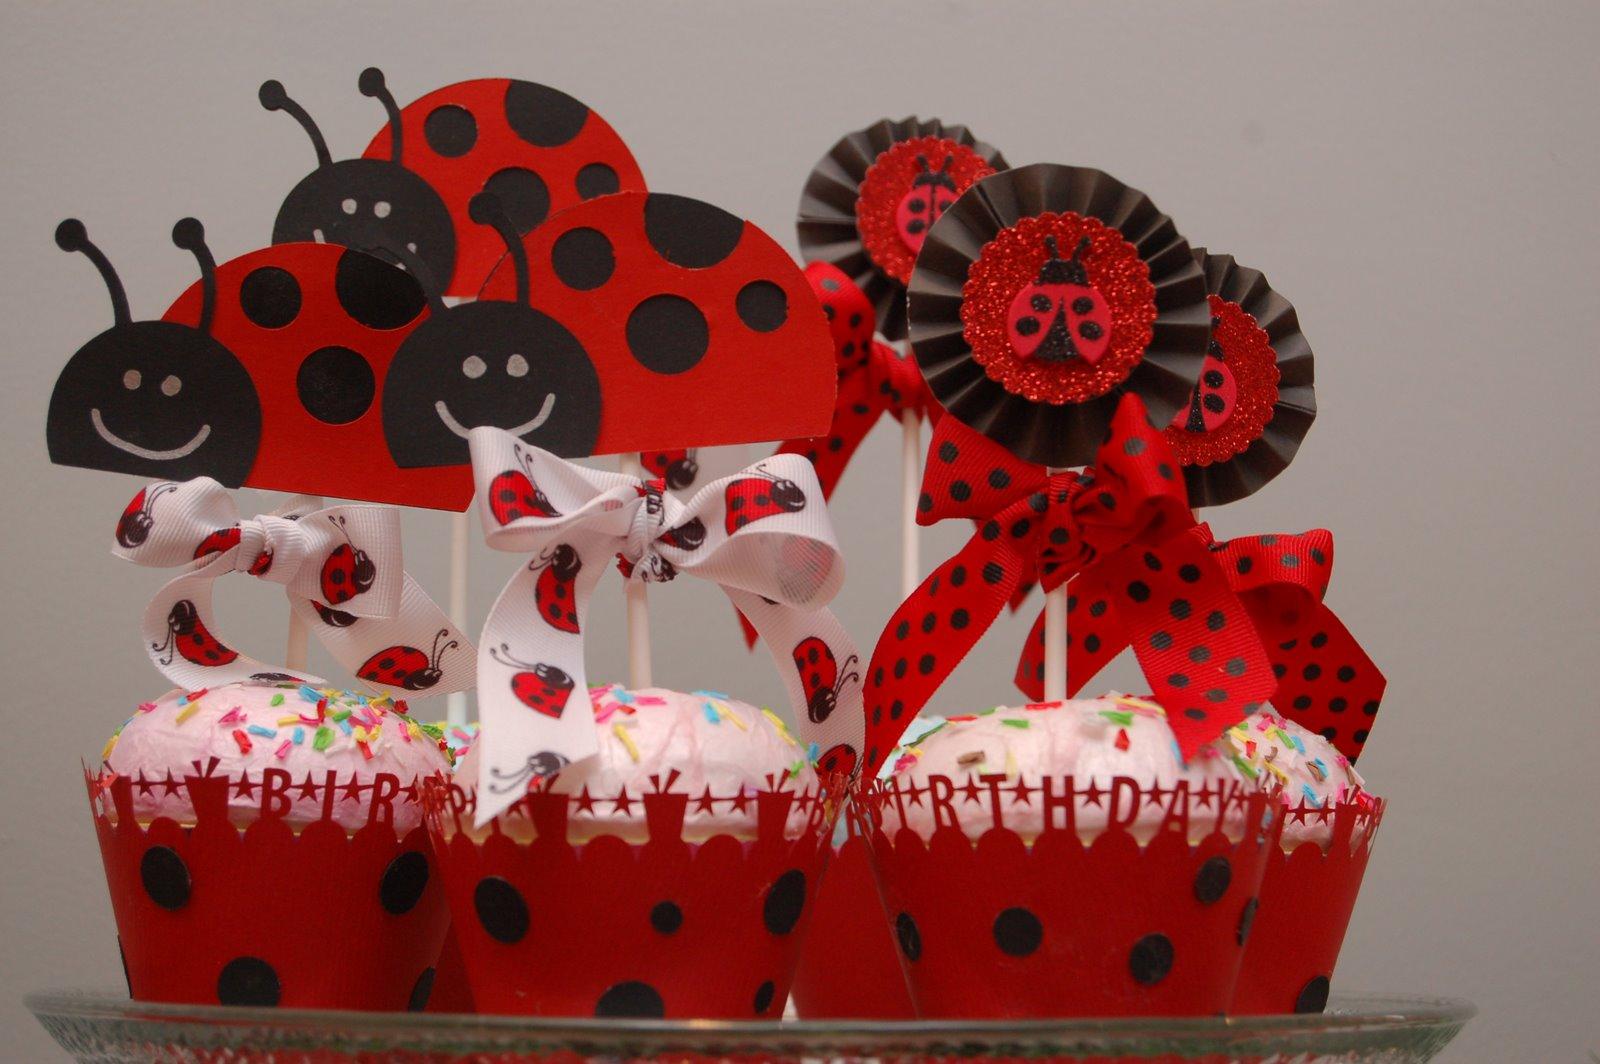 Maddysons Lane Lady Bug Party - Bug cupcake decorating ideas